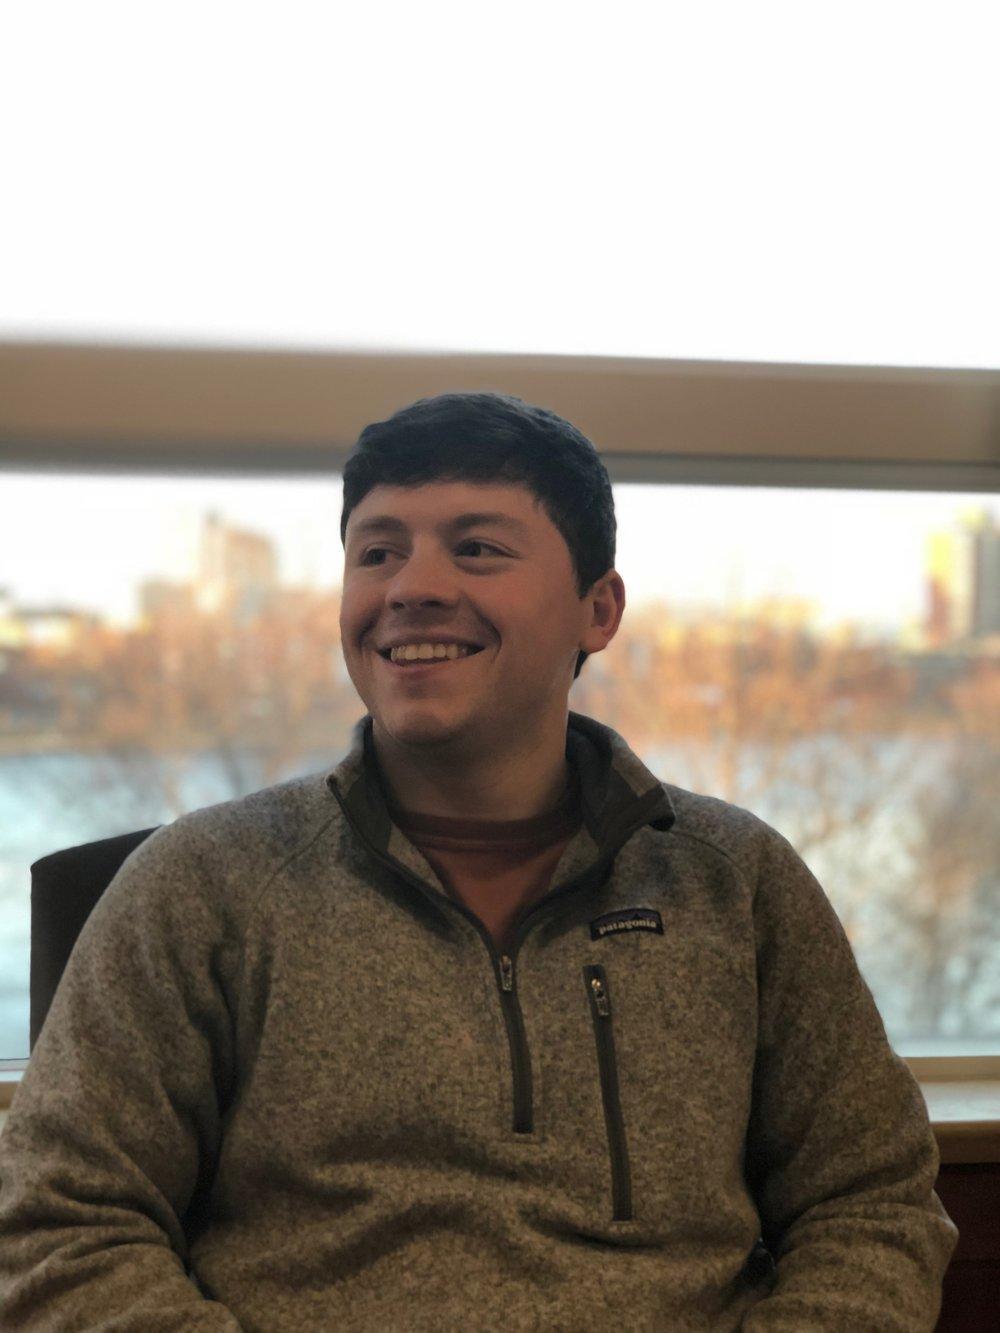 Name: Chandler Ryan Henning   Hometown: Simsbury, CT   Fraternal Class: Alpha   Major: International Relations & Economics